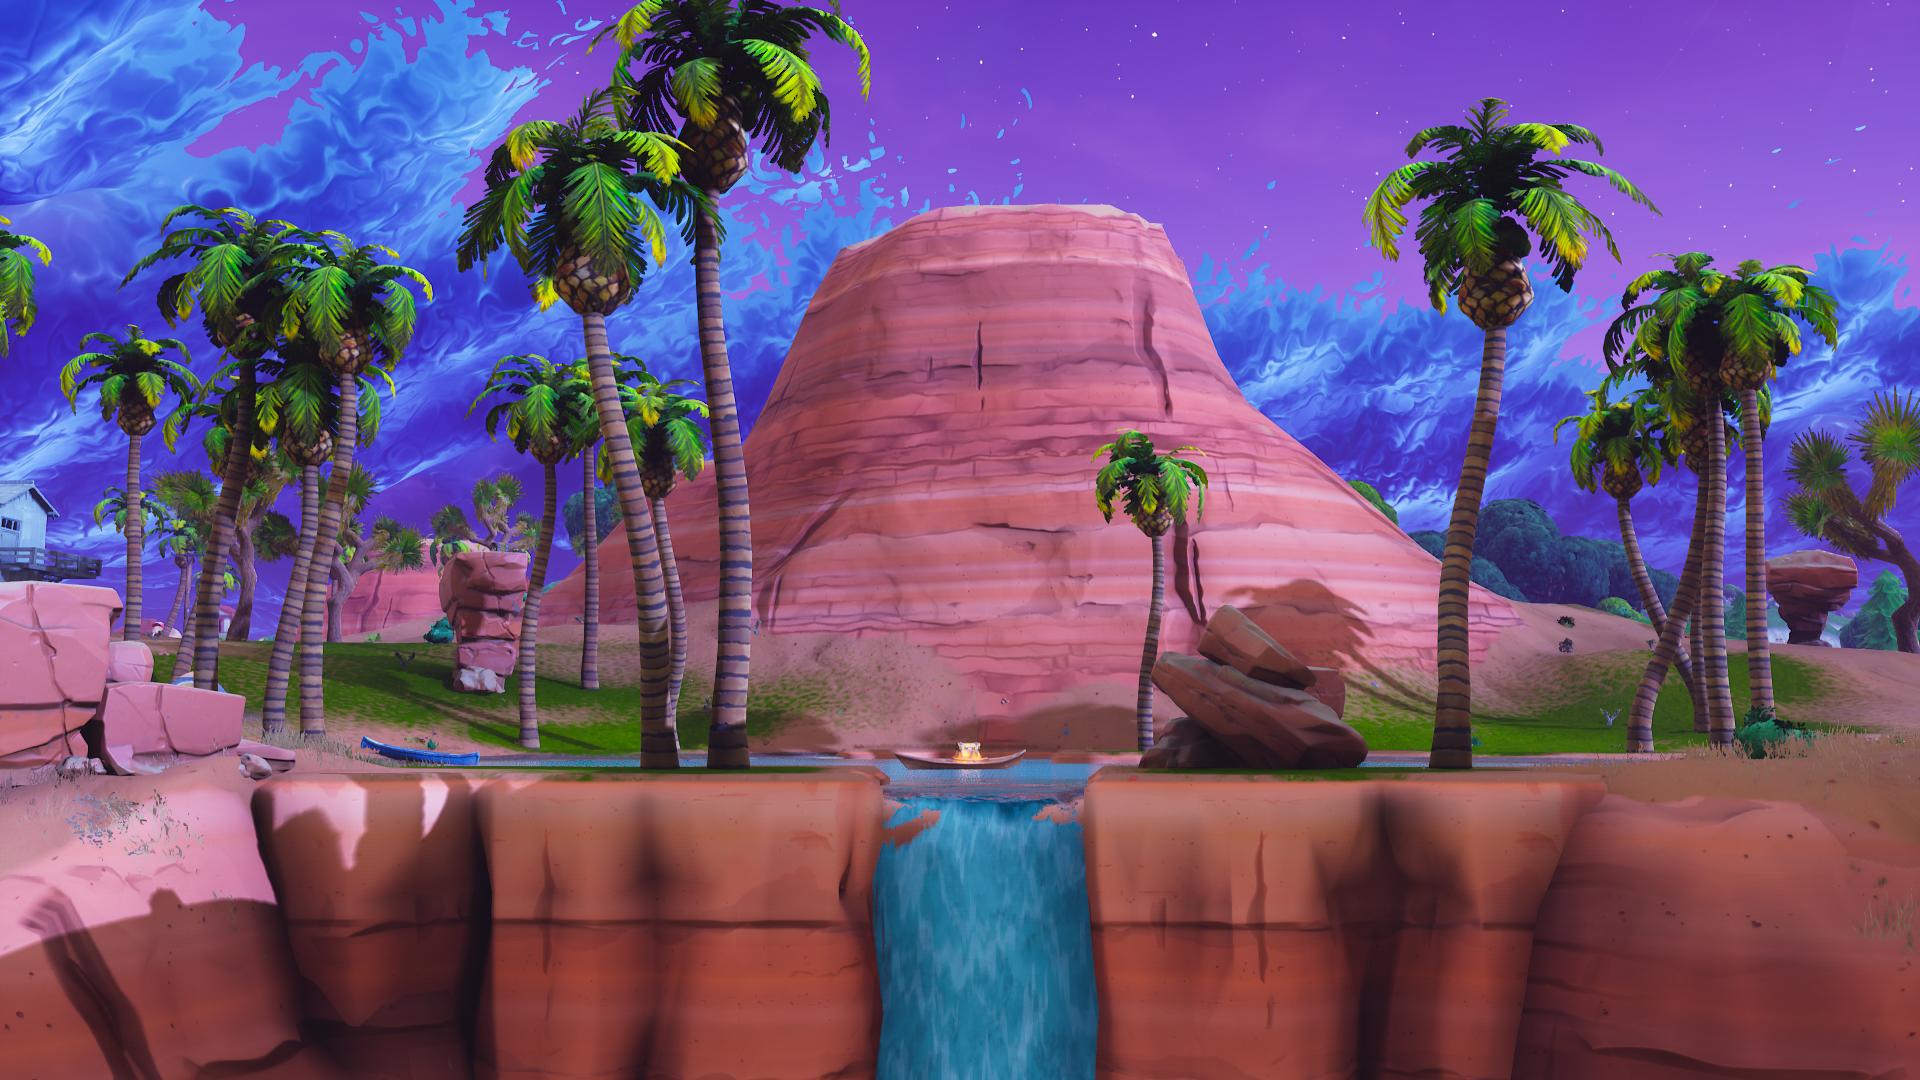 Desert Island HD Wallpaper | Background Image | 1920x1080 ...